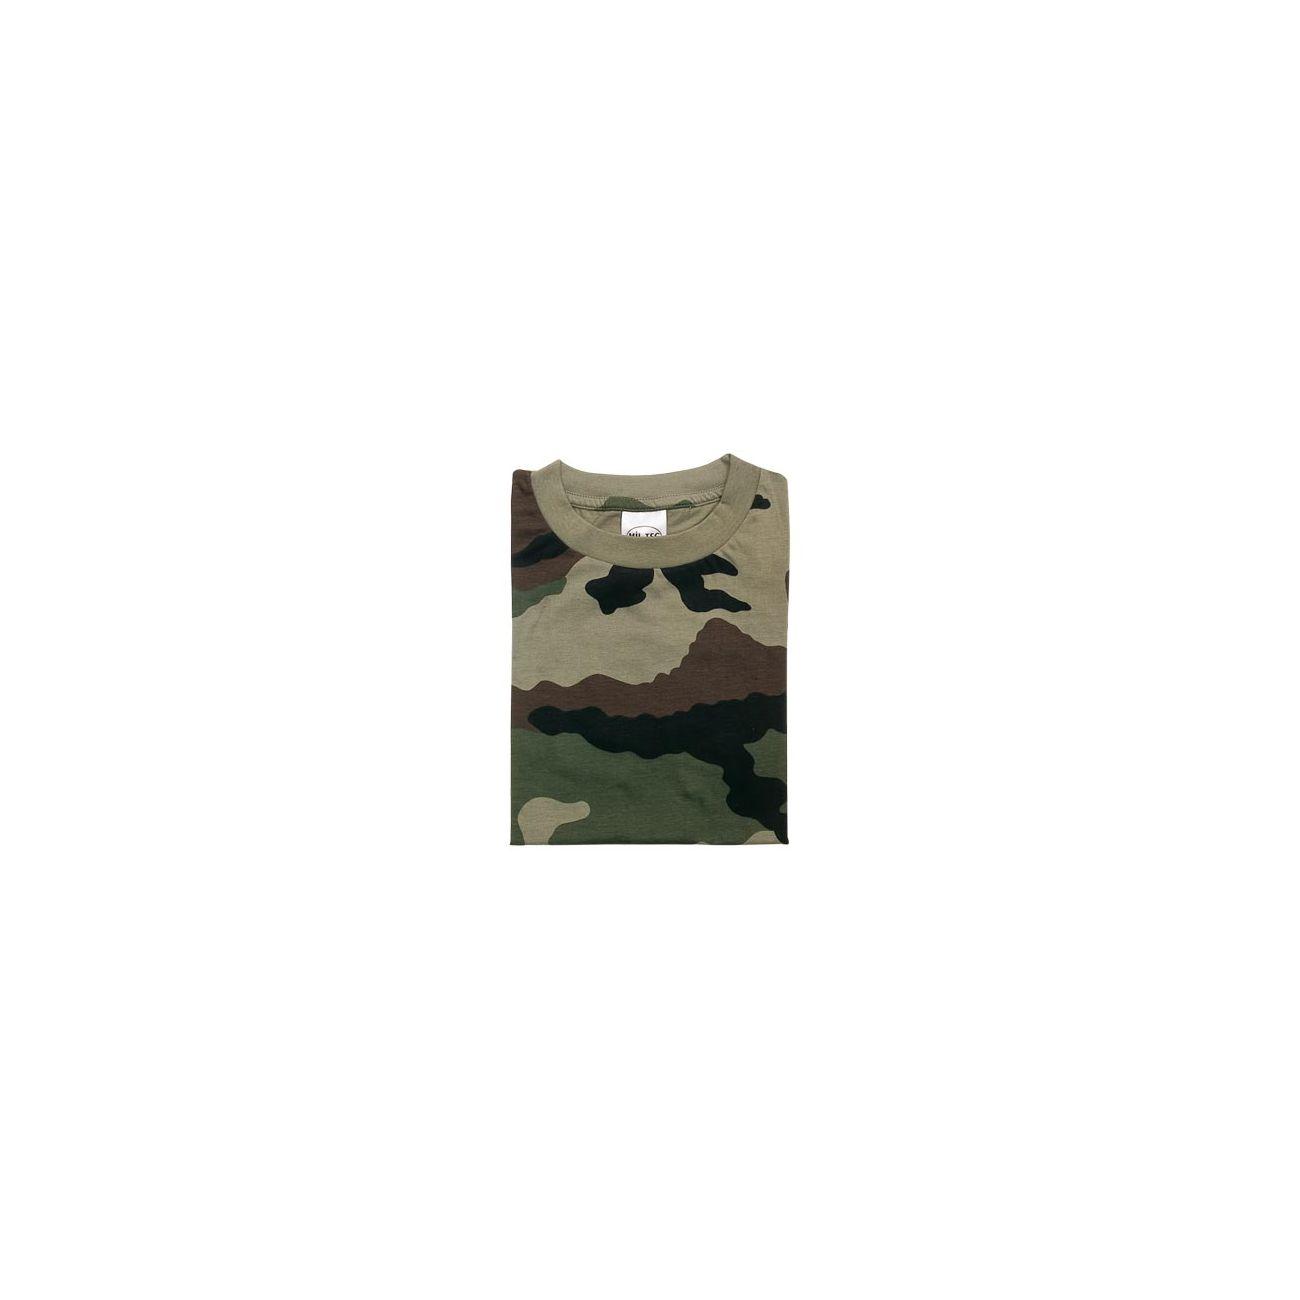 3035357fd4e707 MFH T-Shirt halbarm CCE günstig kaufen - Kotte & Zeller